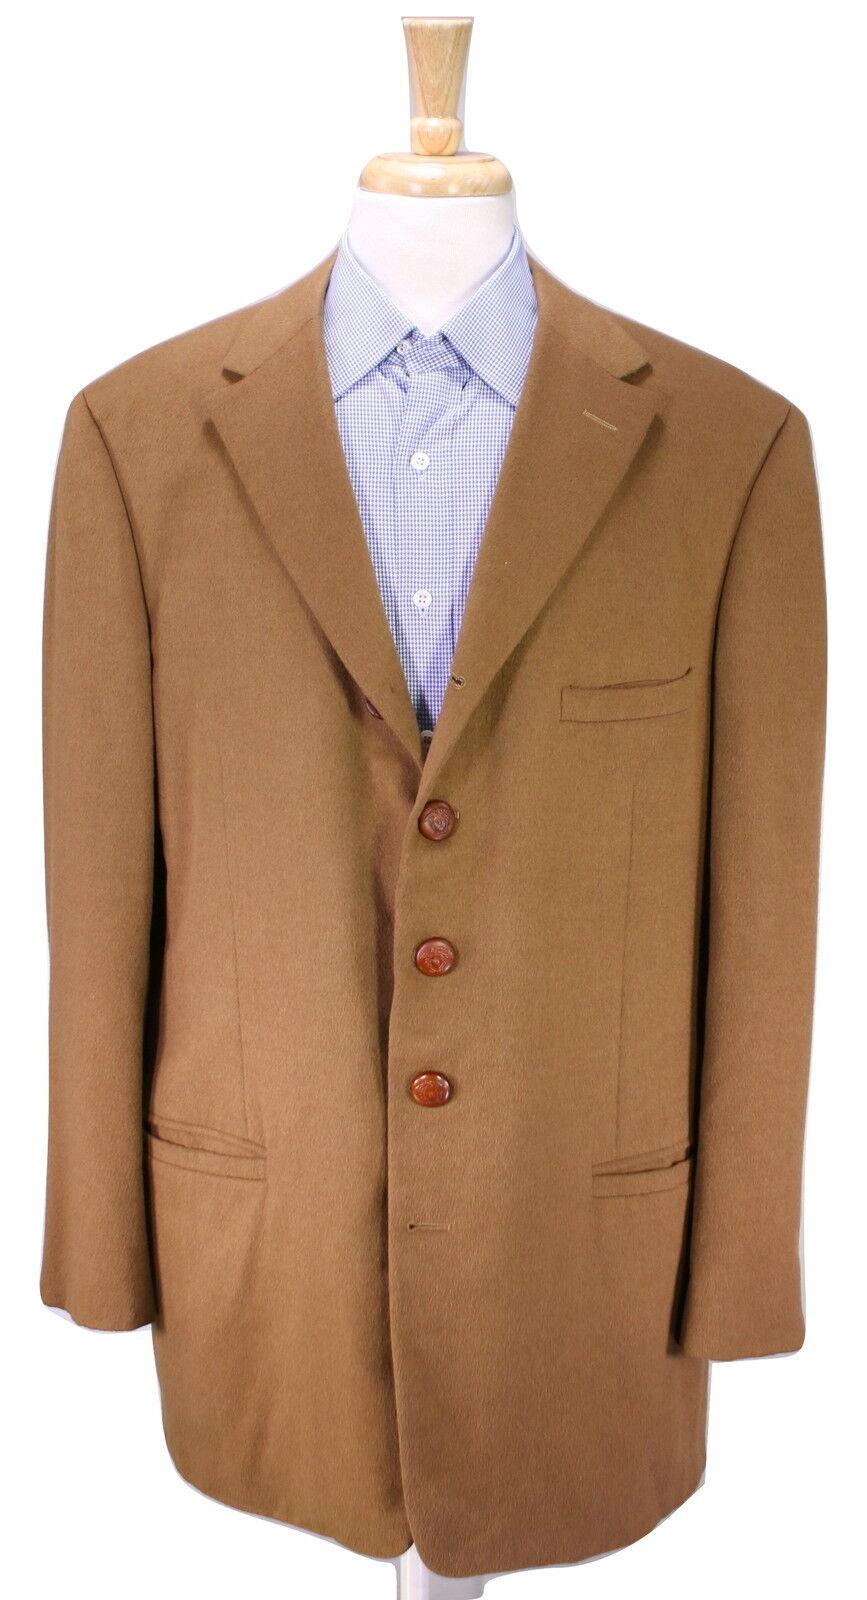 GIANNI VERSACE  Camel Braun 5-Btn 100% Cashmere Sportcoat Blazer 46L